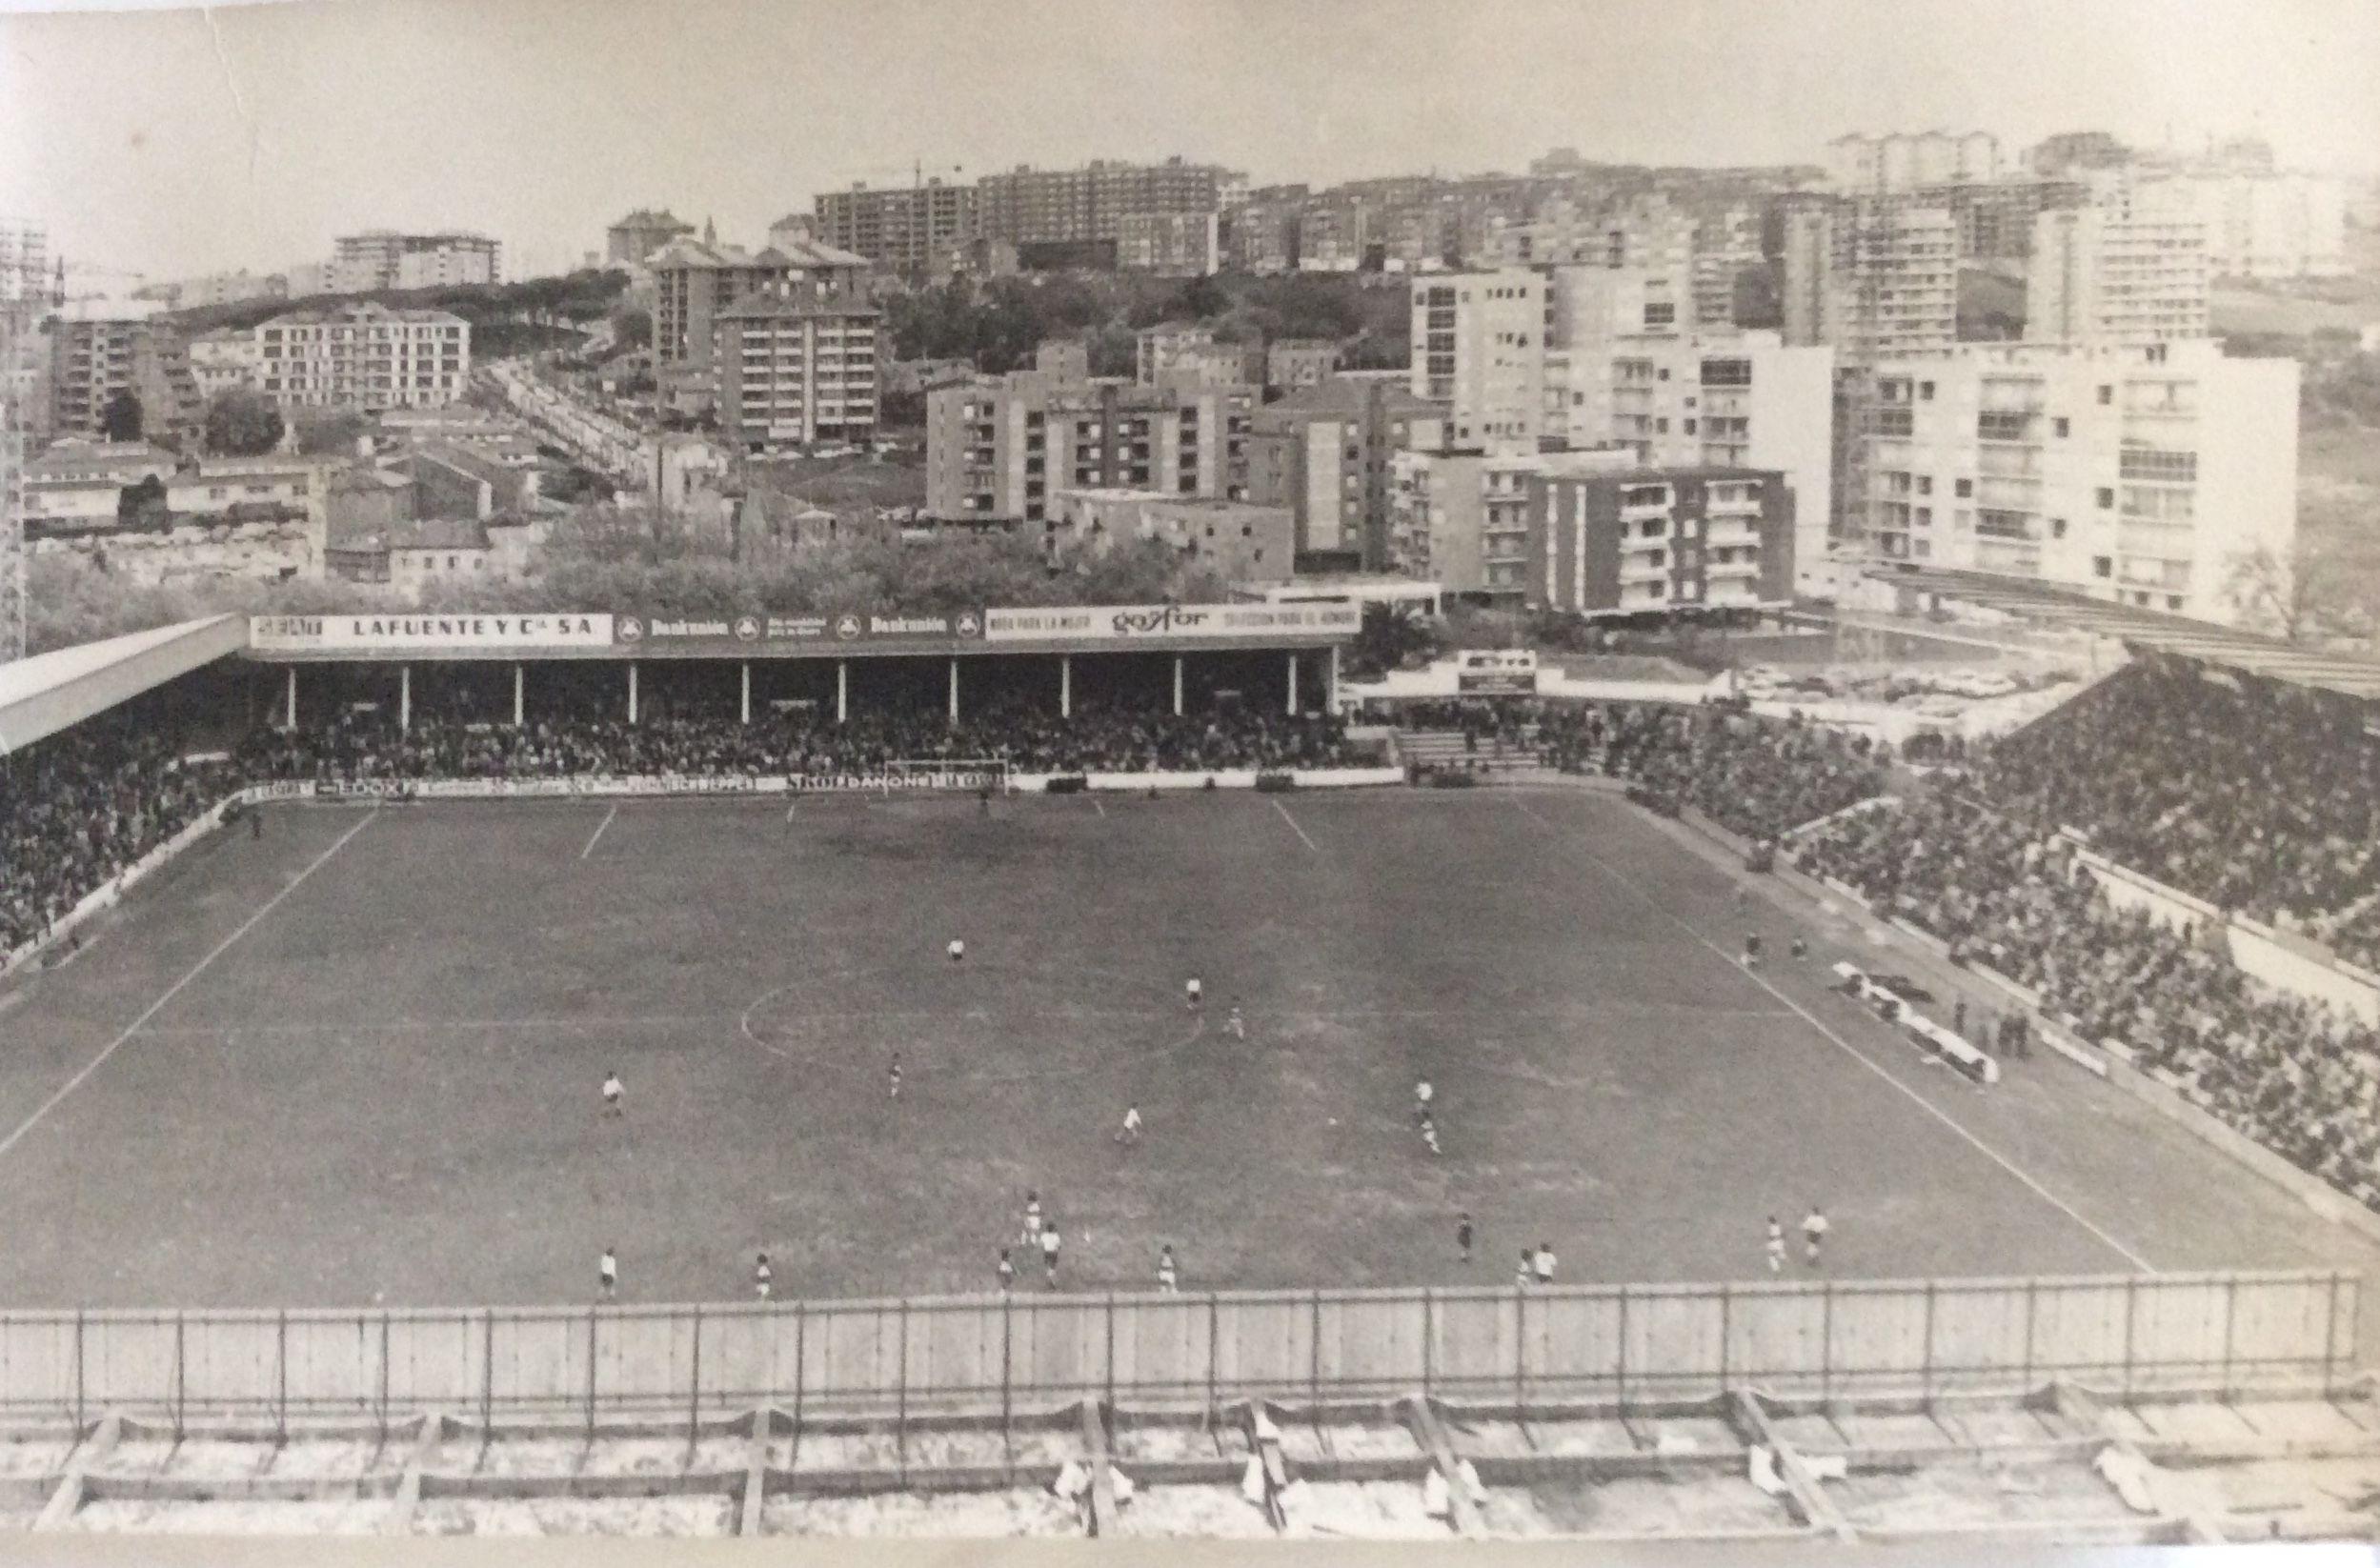 FOTOS HISTORICAS O CHULAS  DE FUTBOL - Página 16 195e85ecf66127921af12048b860c0d5